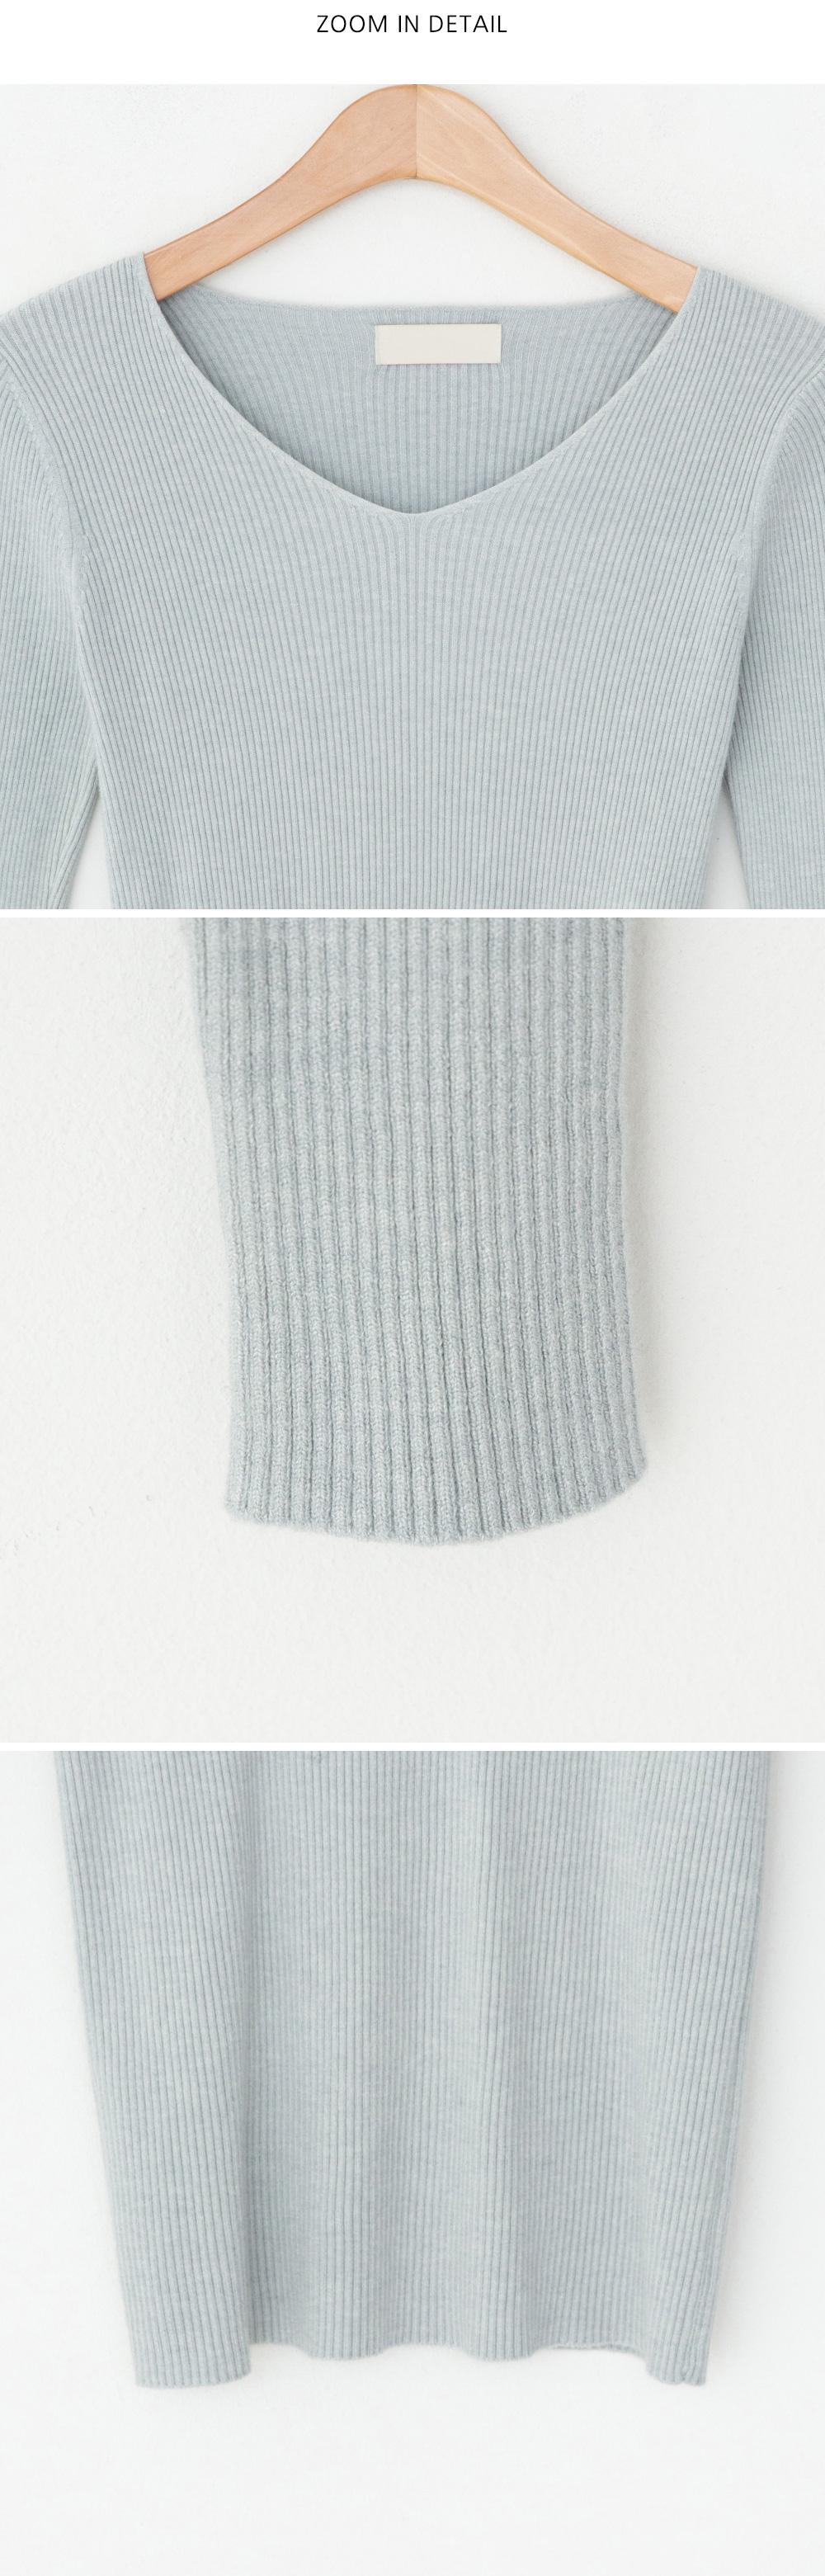 Lenny V-Neck Ribbed Knitwear